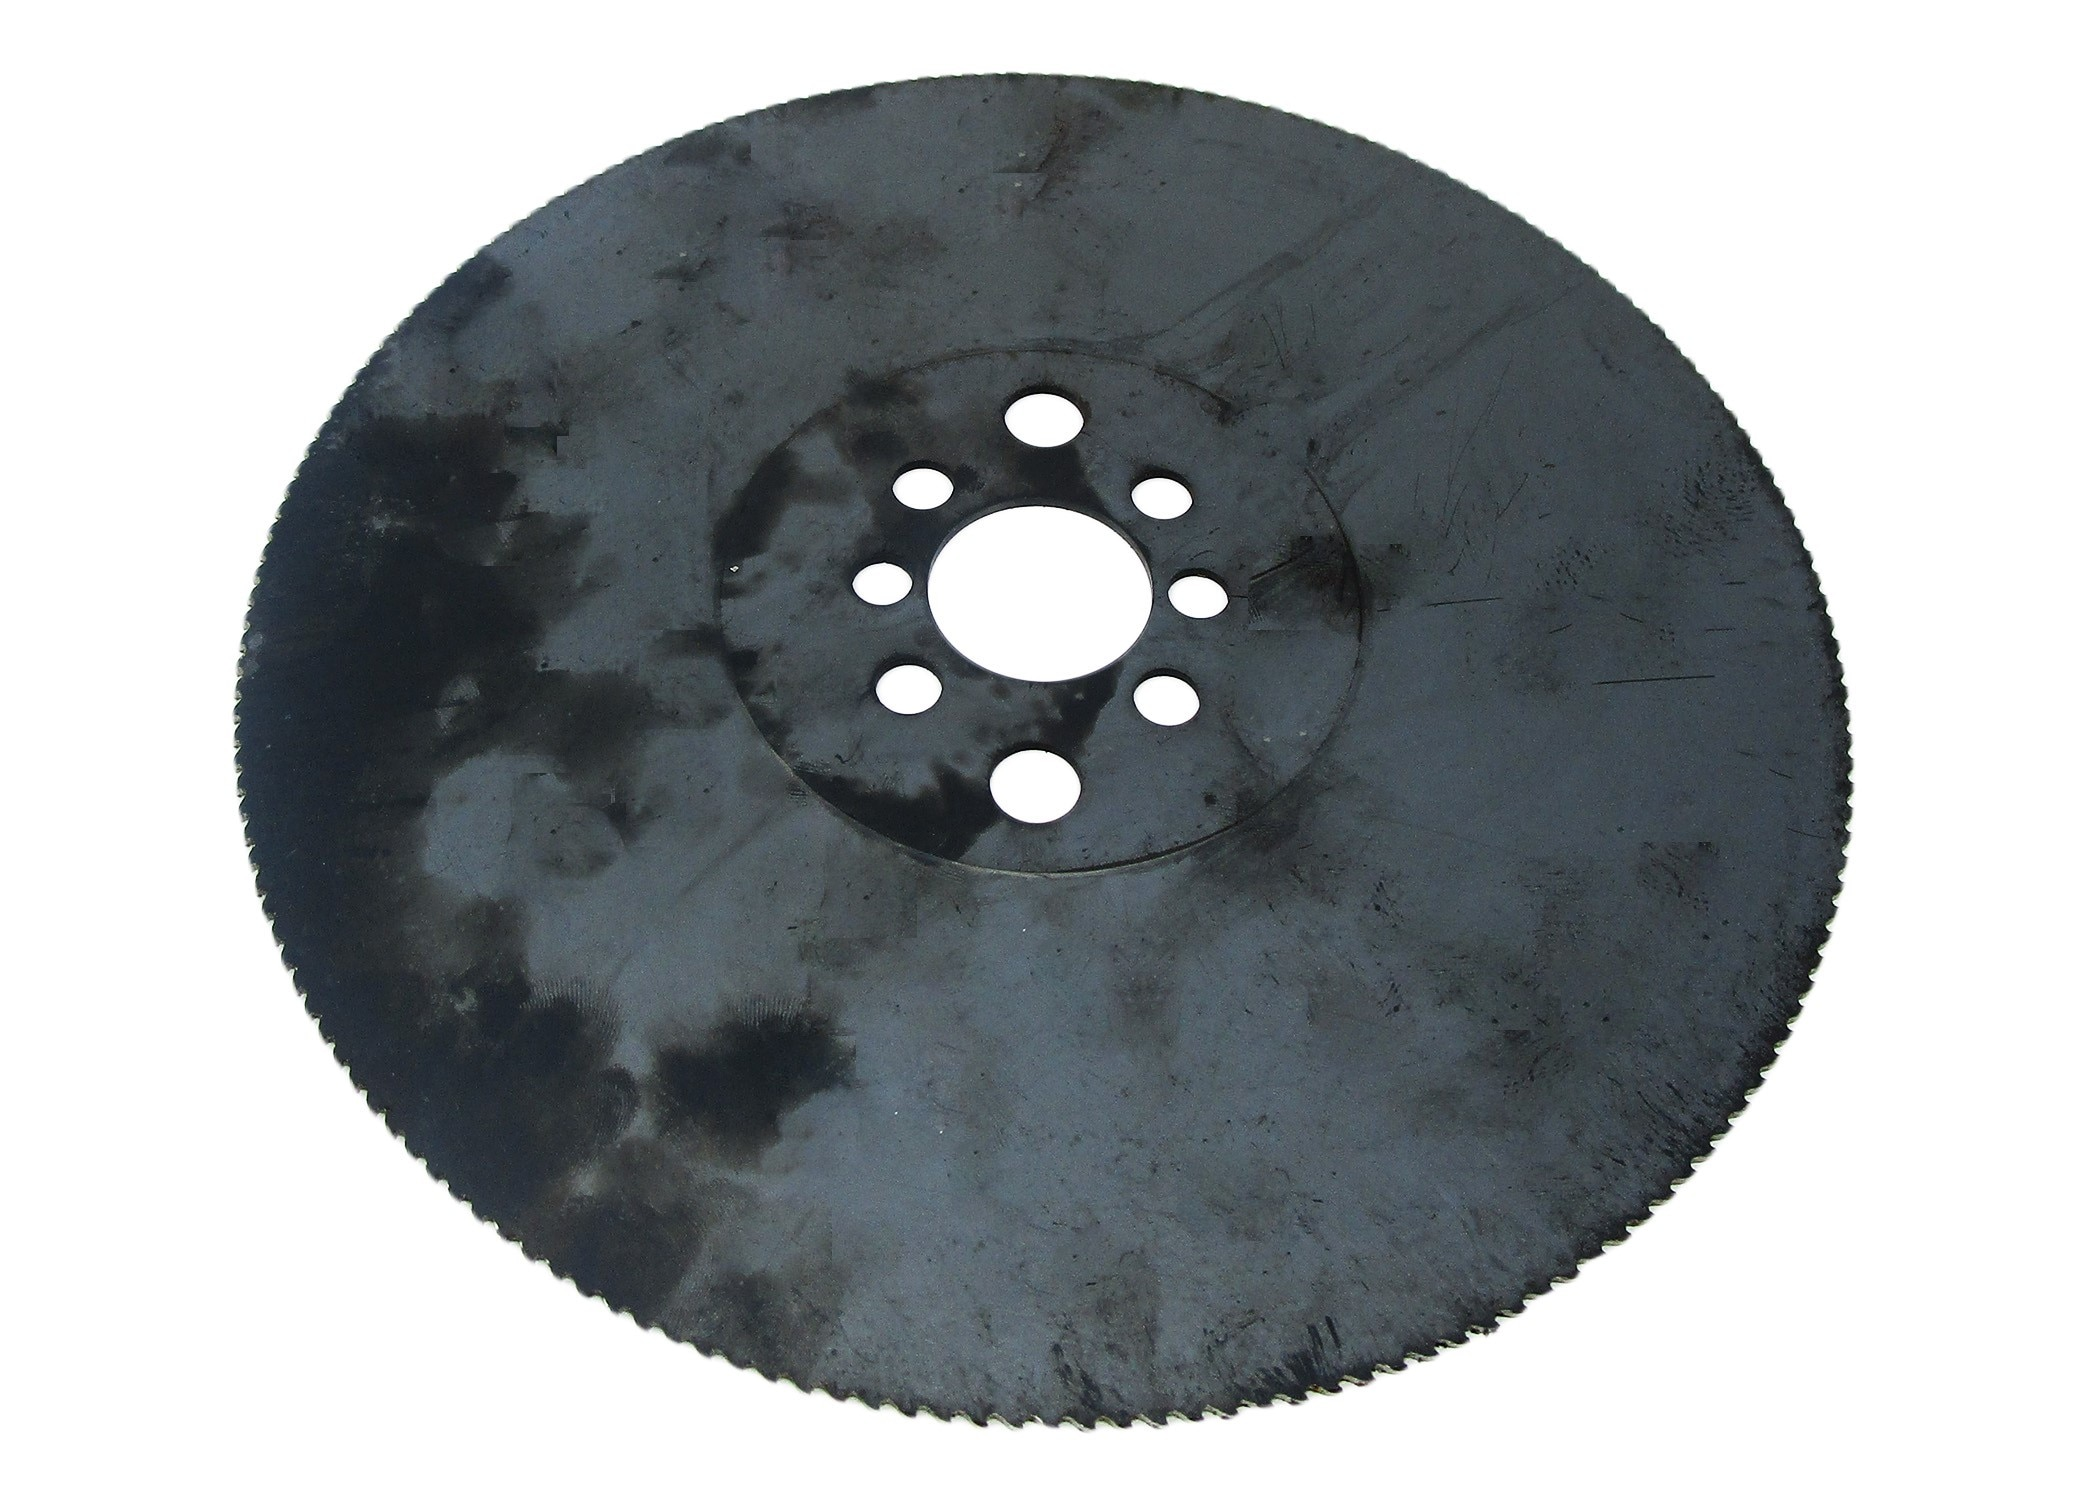 Ferrous Circular Saw Blade 225mm x 32mm x 2mm x 180T For F-225